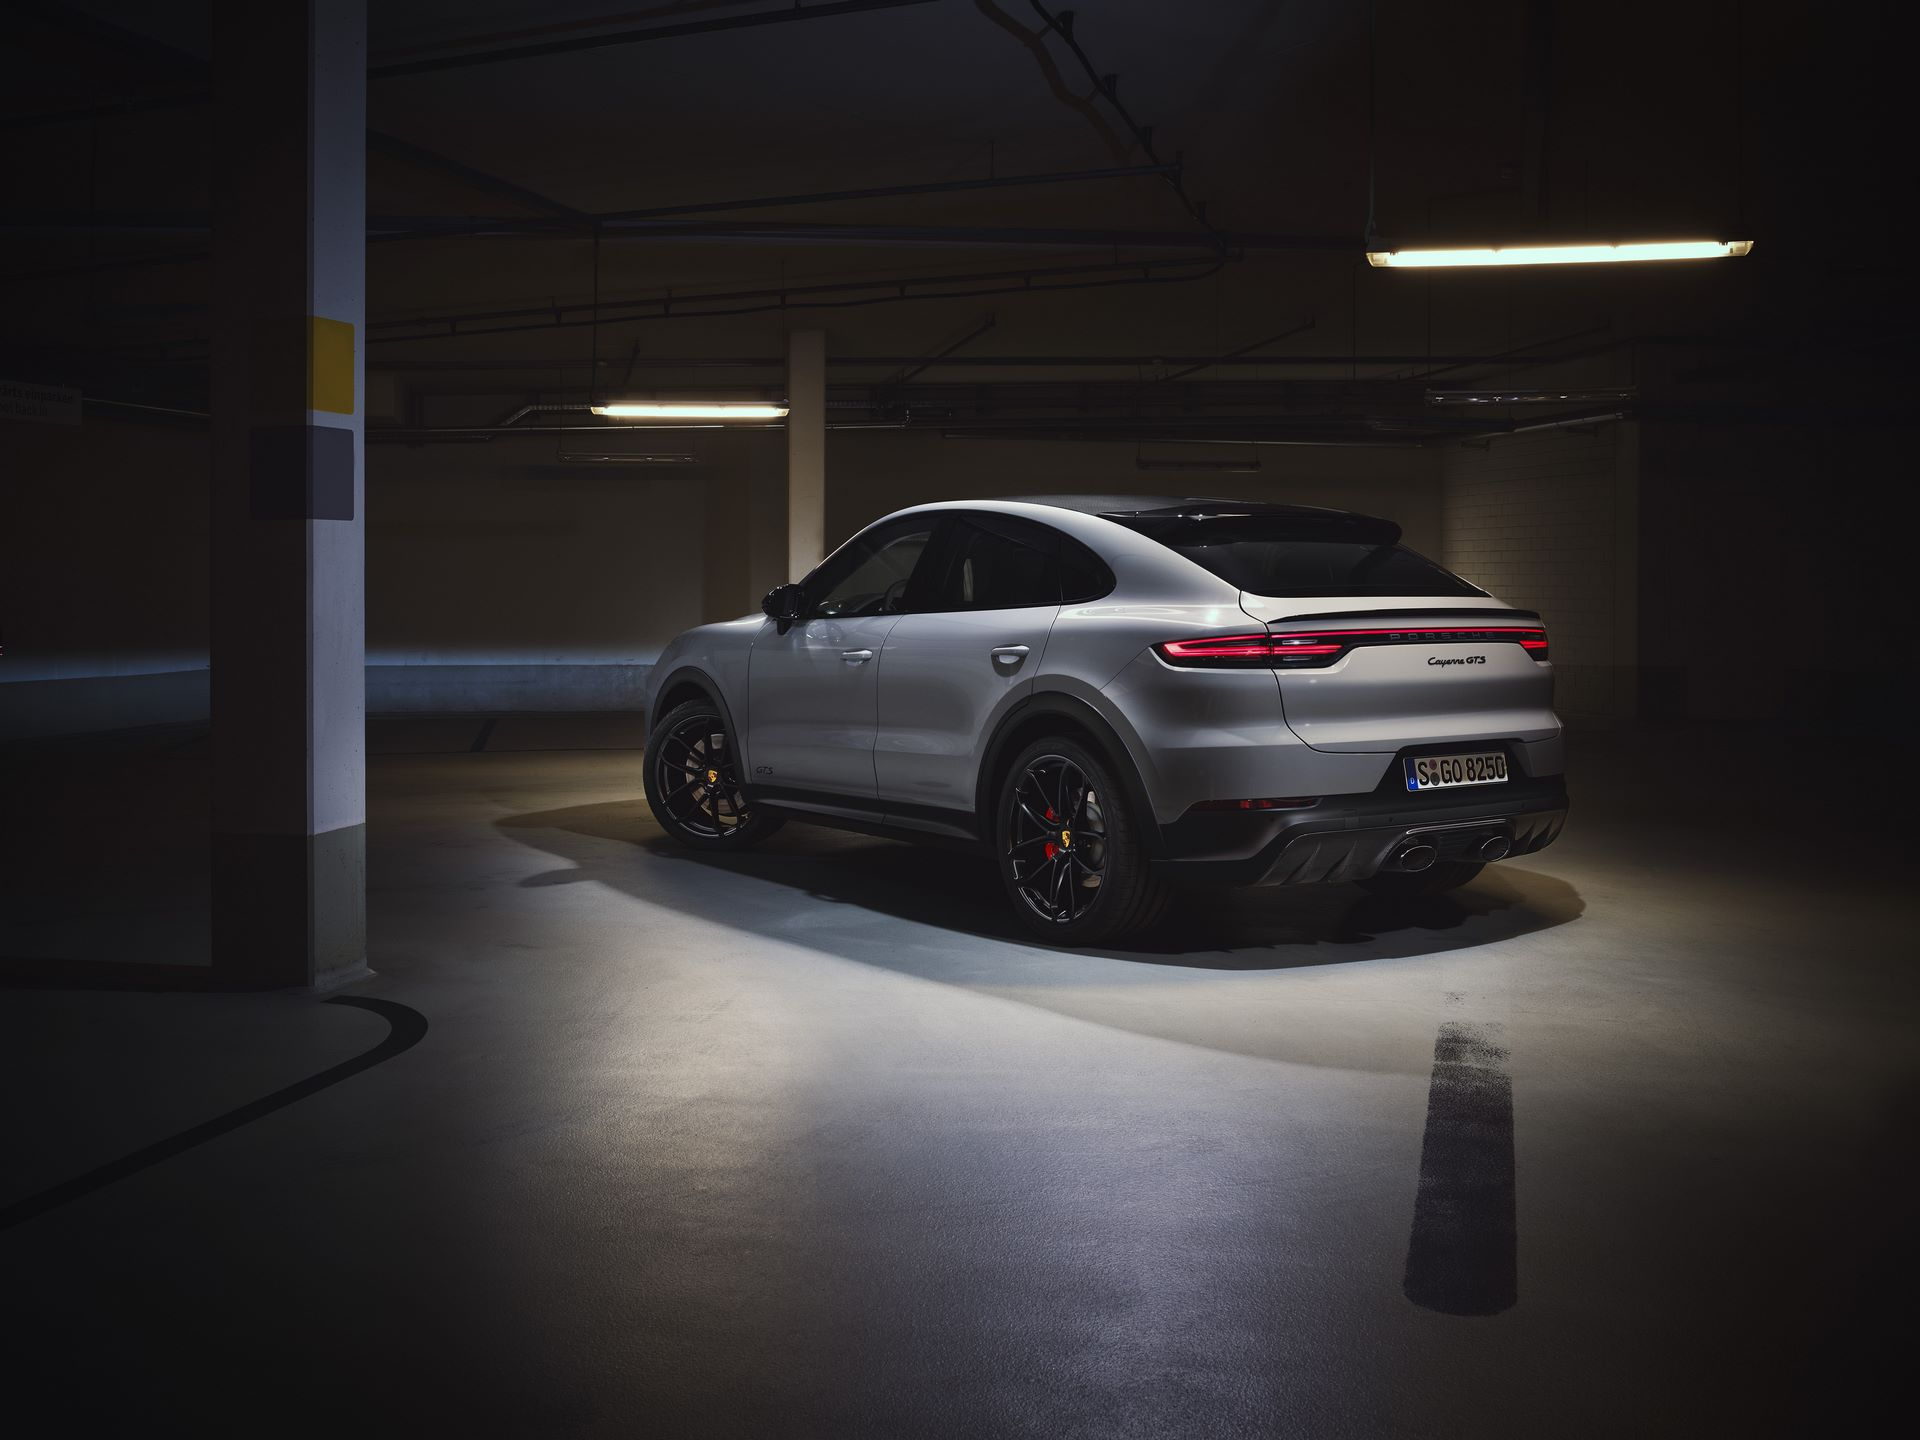 Porsche-Cayenne-GTS-and-Cayenne-GTS-Coupe-2021-2